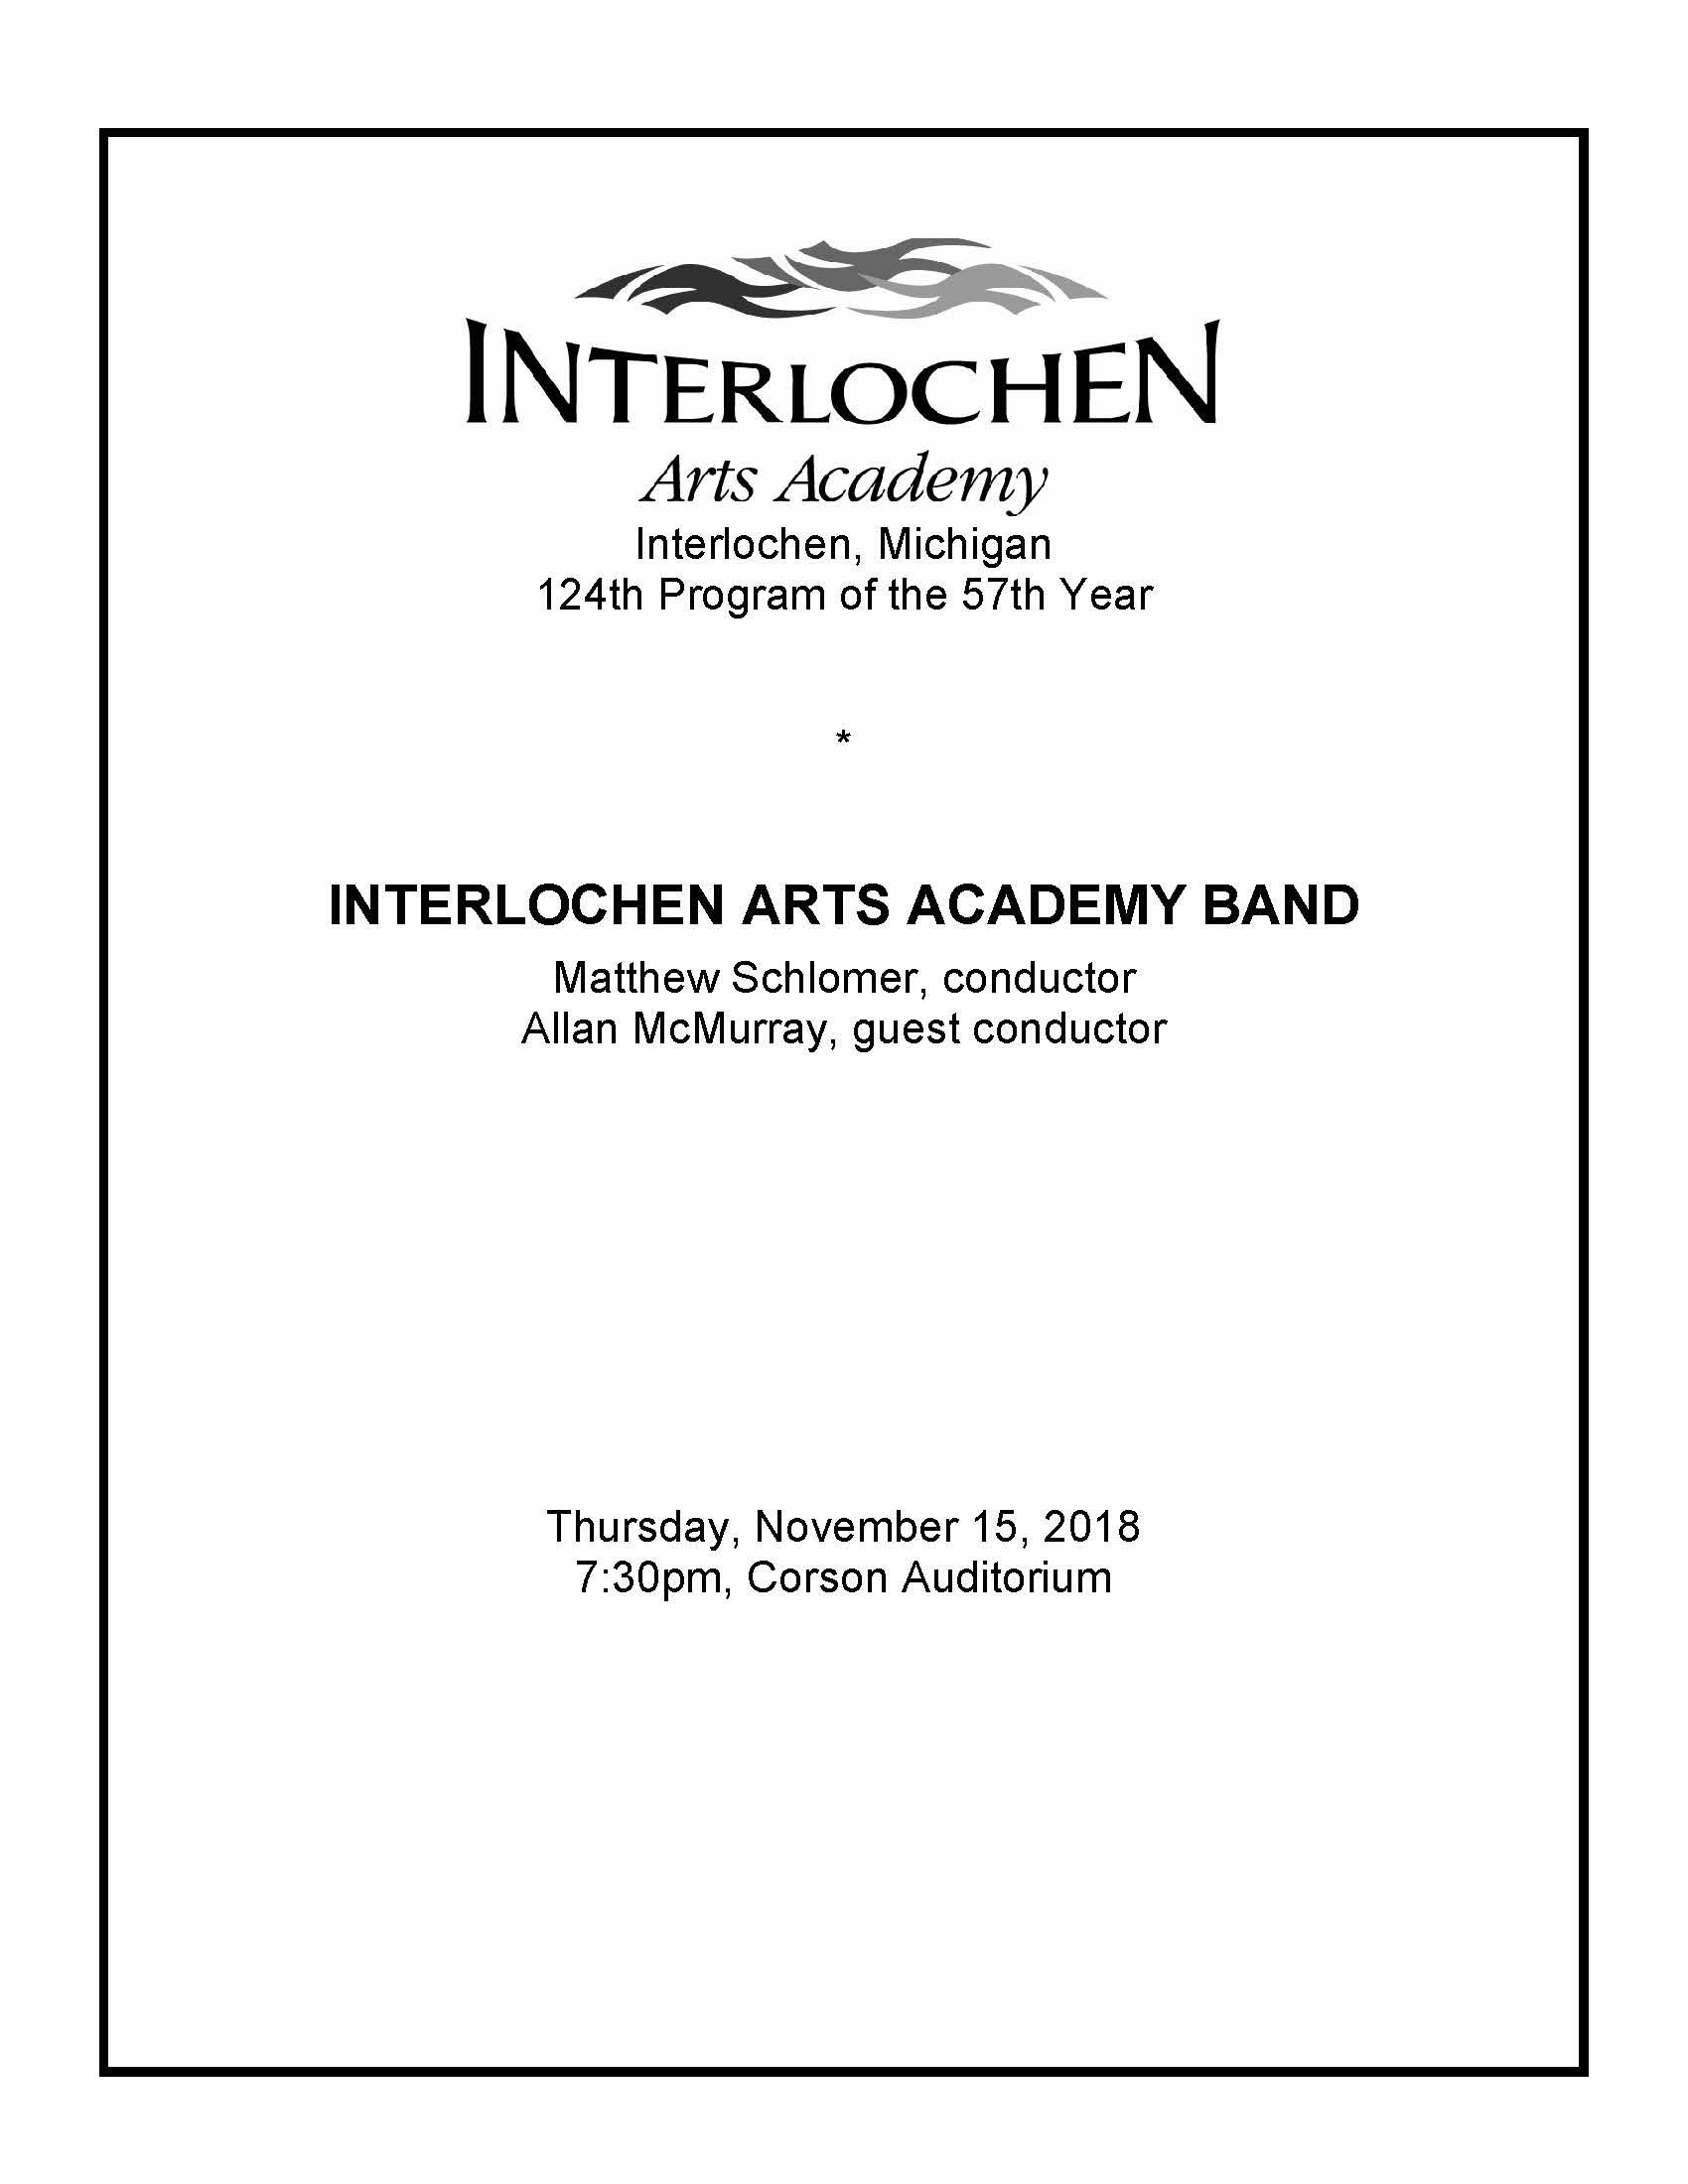 2018-11-15 IAA Band | Interlochen